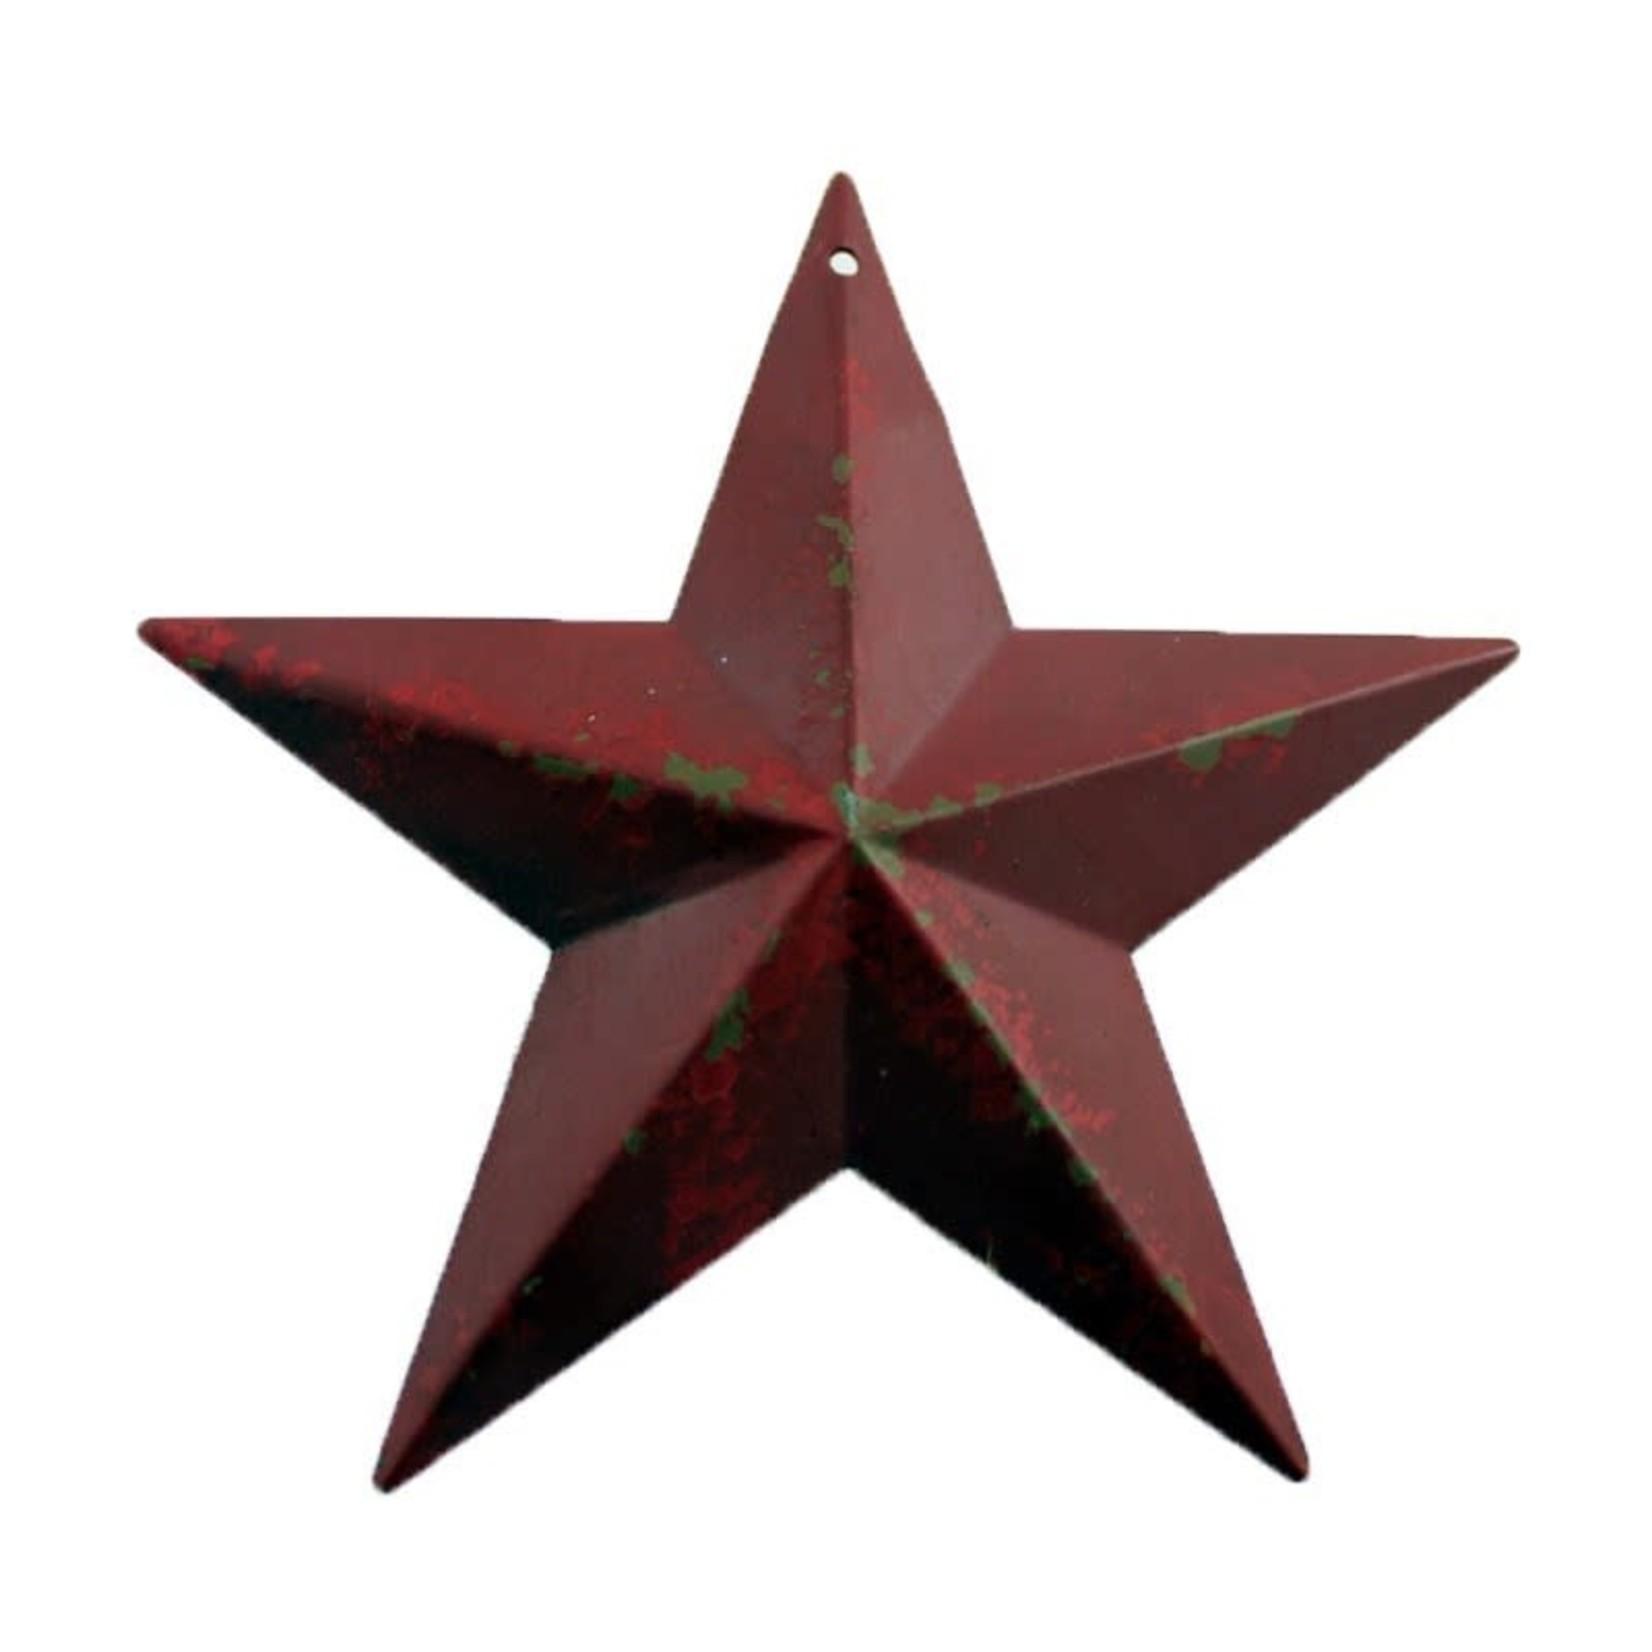 Antique Star - Red